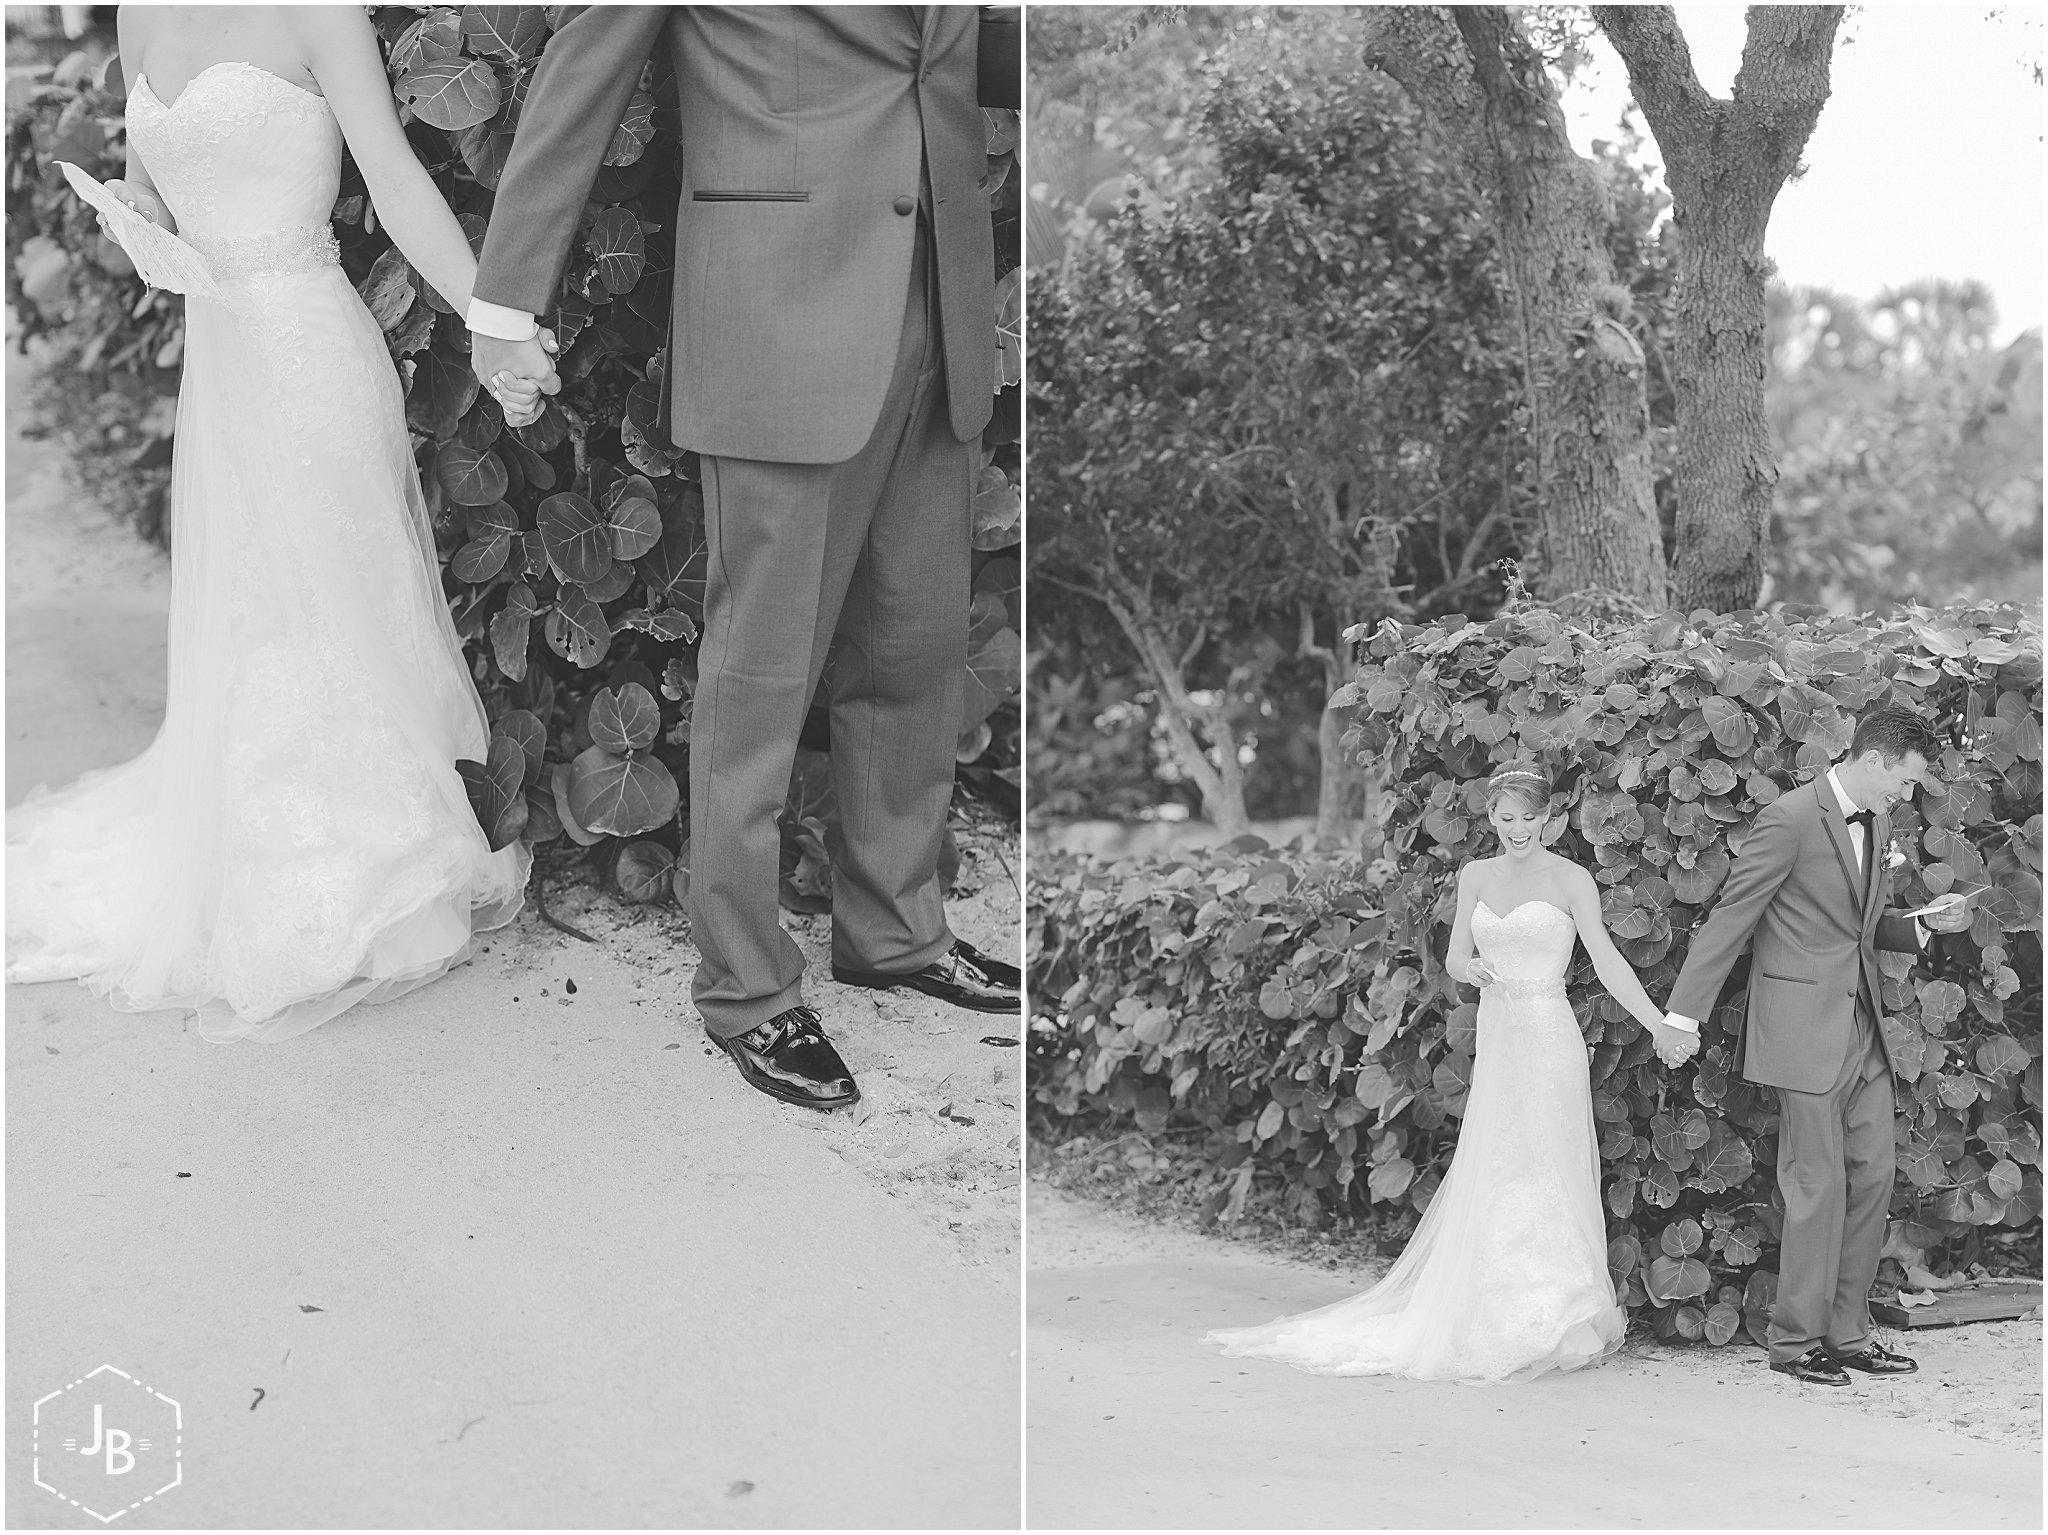 WeddingandEngagementFloridaPhotographer_0334.jpg